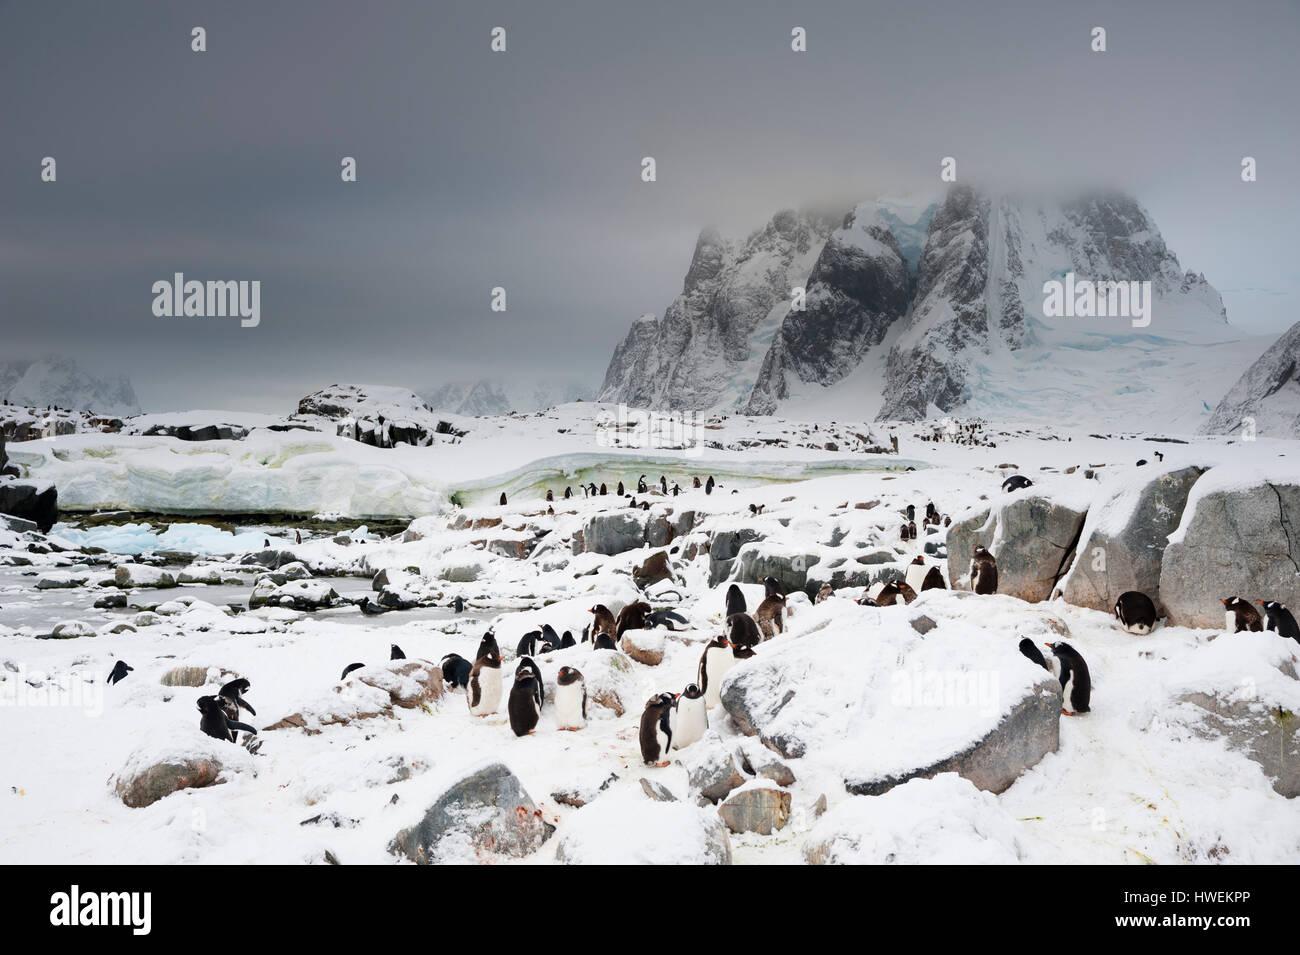 Gentoo penguin colony (Pygoscelis papua), Petermann Island, Antarctica - Stock Image